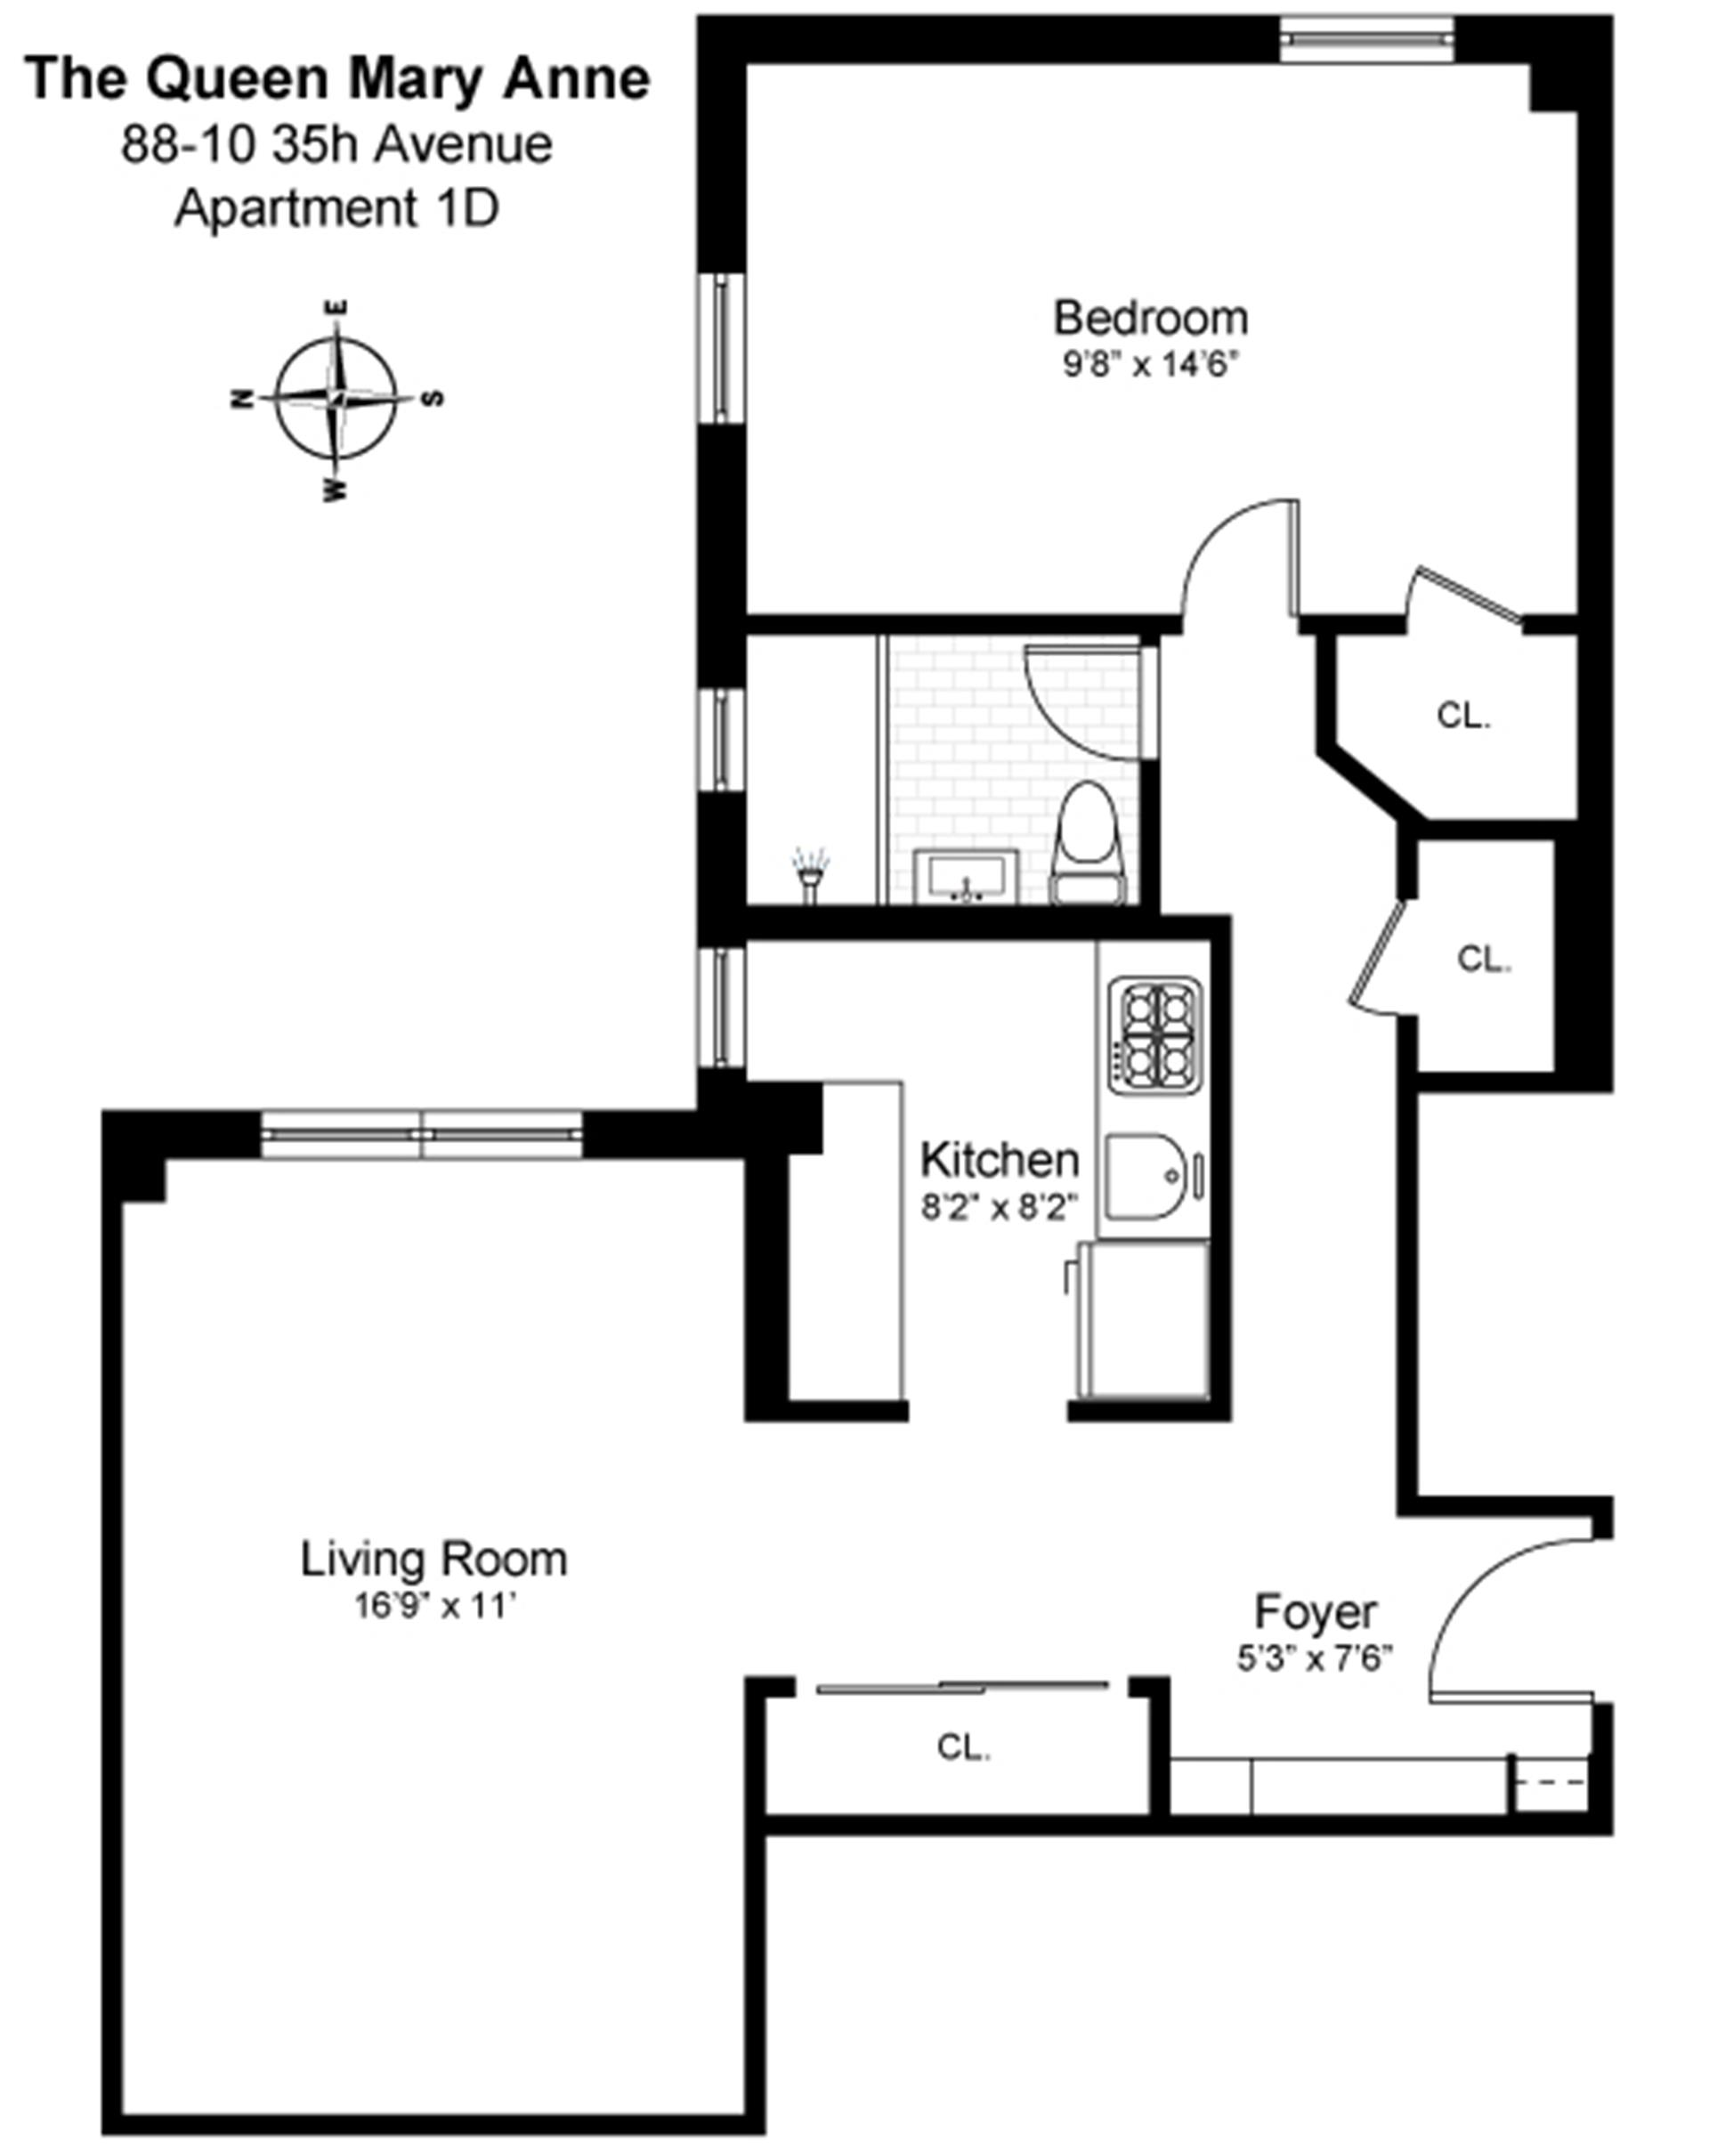 Floor plan of 88-10 35th Avenue, 1D - Jackson Heights, New York